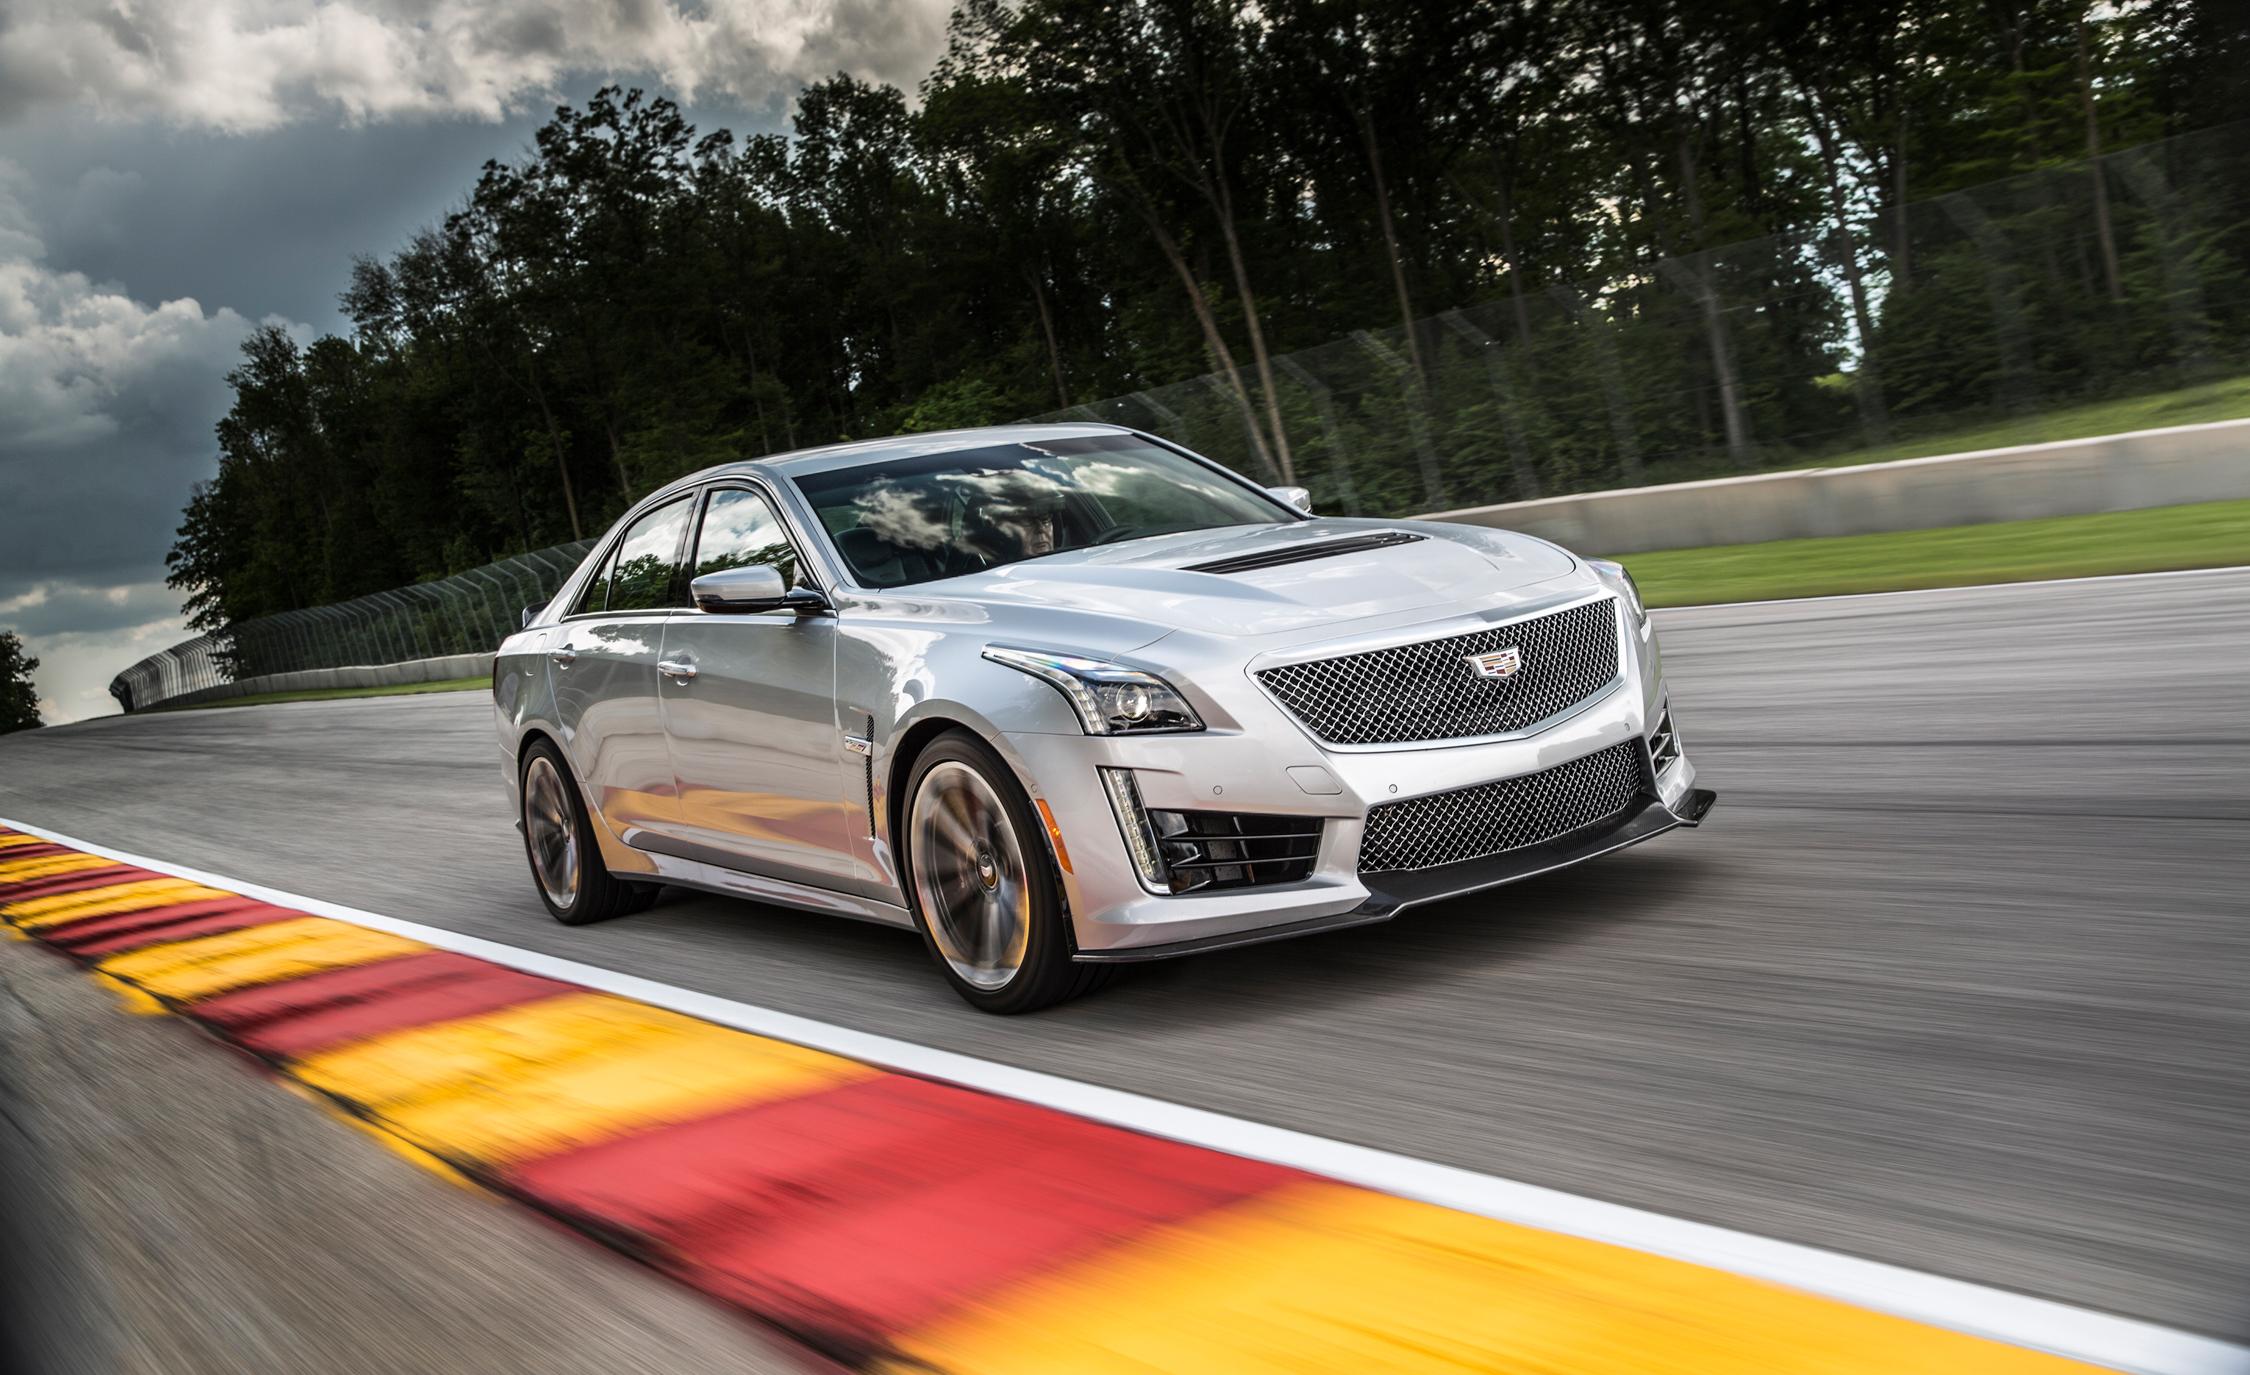 New 2016 Cadillac CTS-V Silver